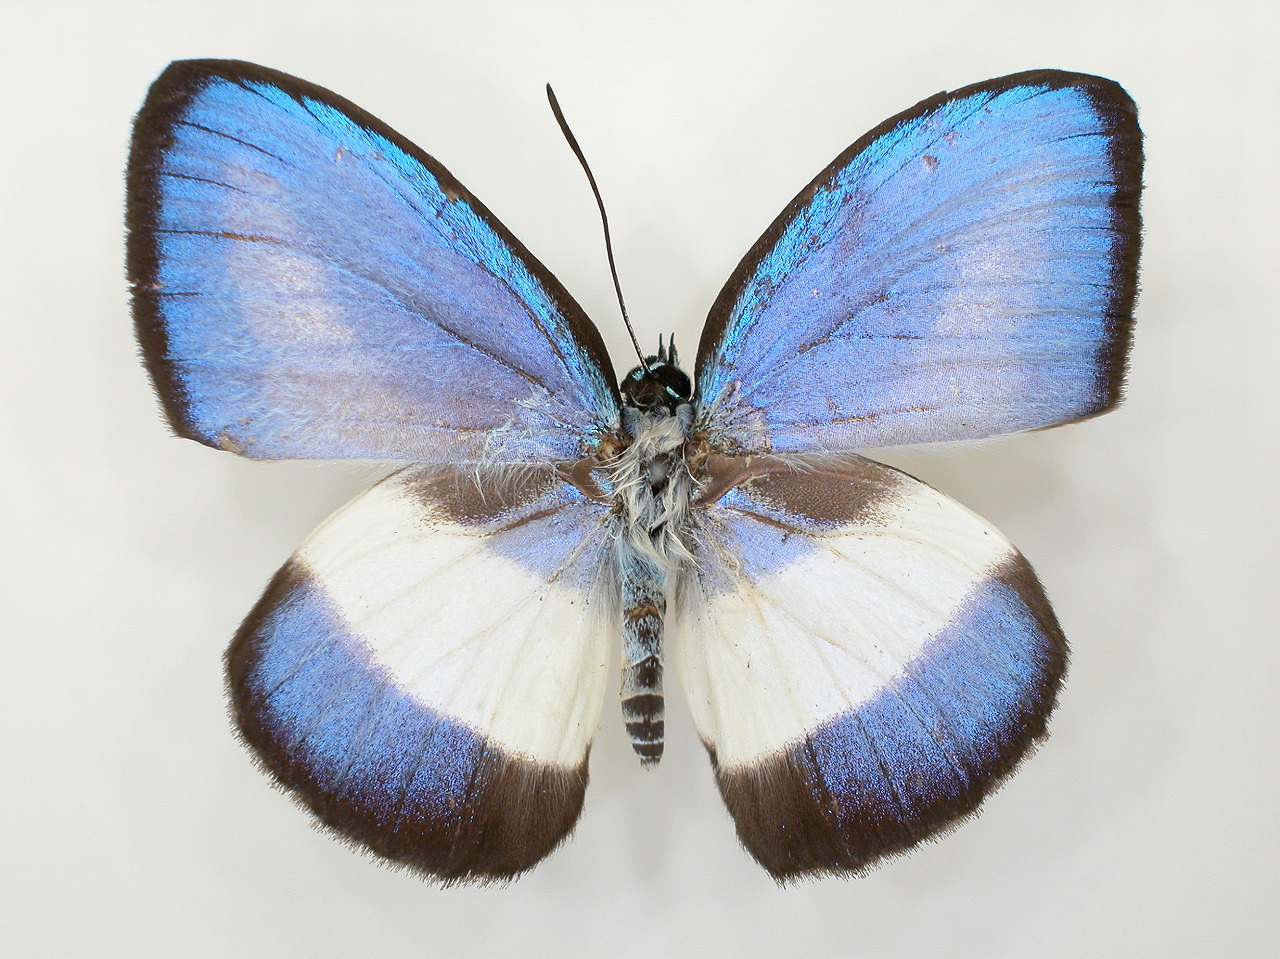 https://www.hitohaku.jp/material/l-material/butterfly-wing/5-lycaenidae/B1-273536_A.jpg